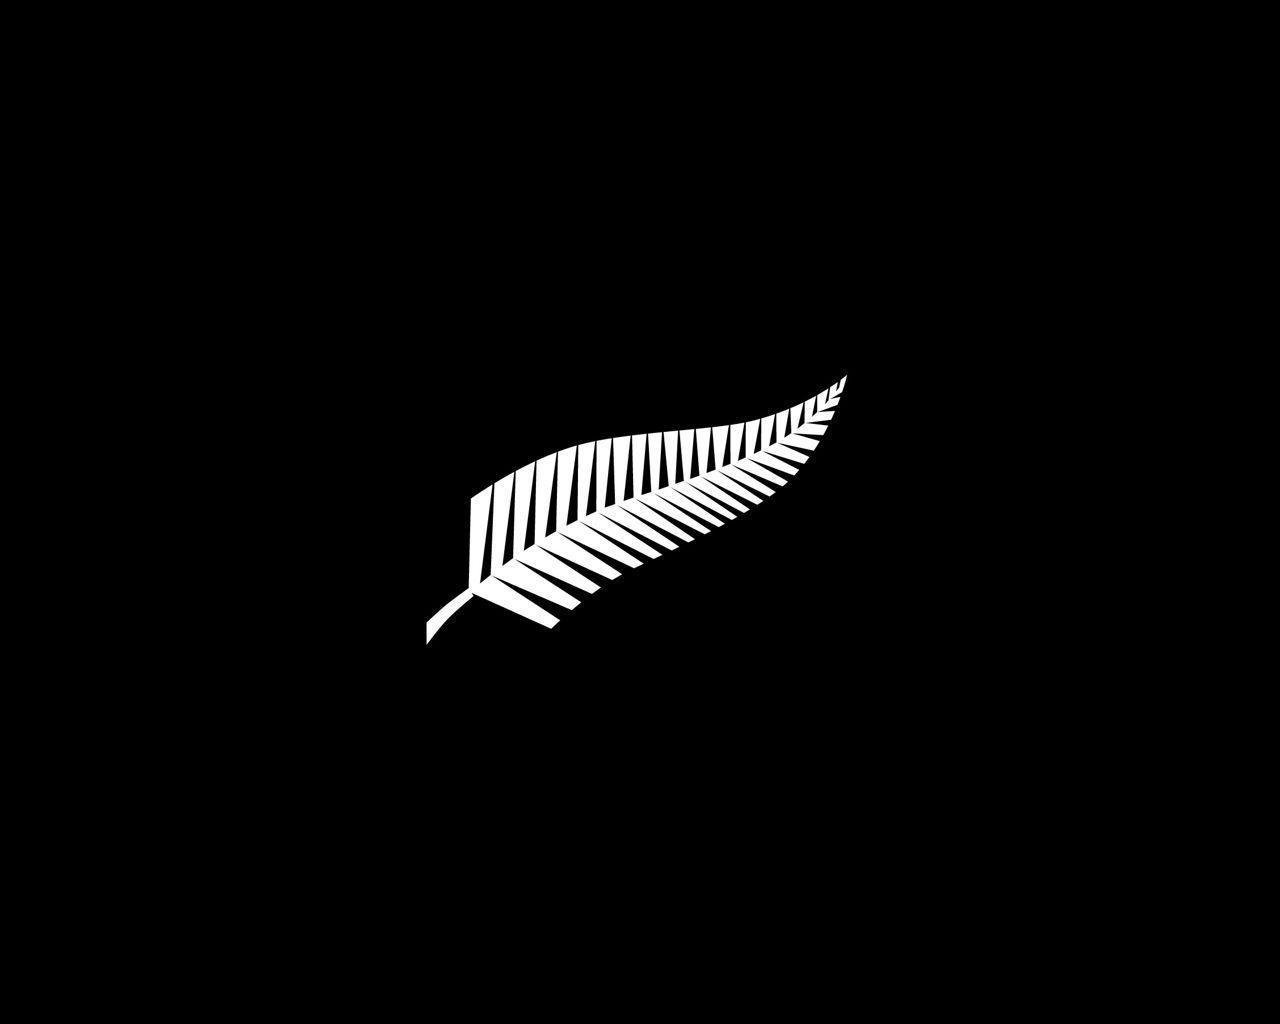 New Zealand All Blacks Wallpapers.